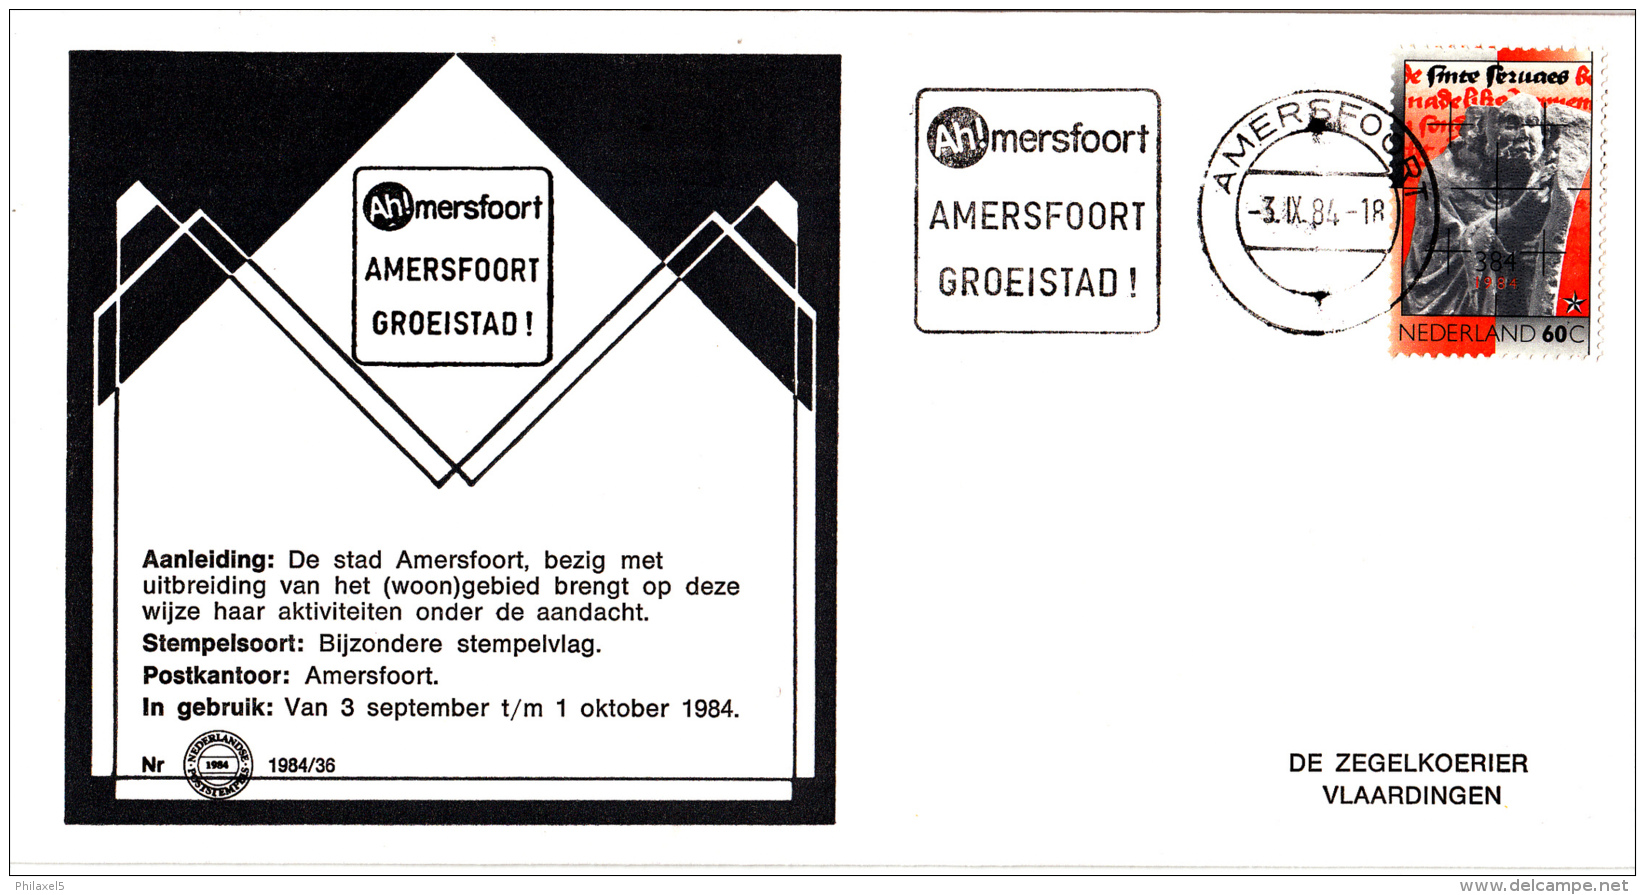 Nederland - Zegelkoerier Nederlandse Poststempels - Amersfoort Groeistad - Nr. 1984/36 - Marcofilie - EMA (Print Machine)